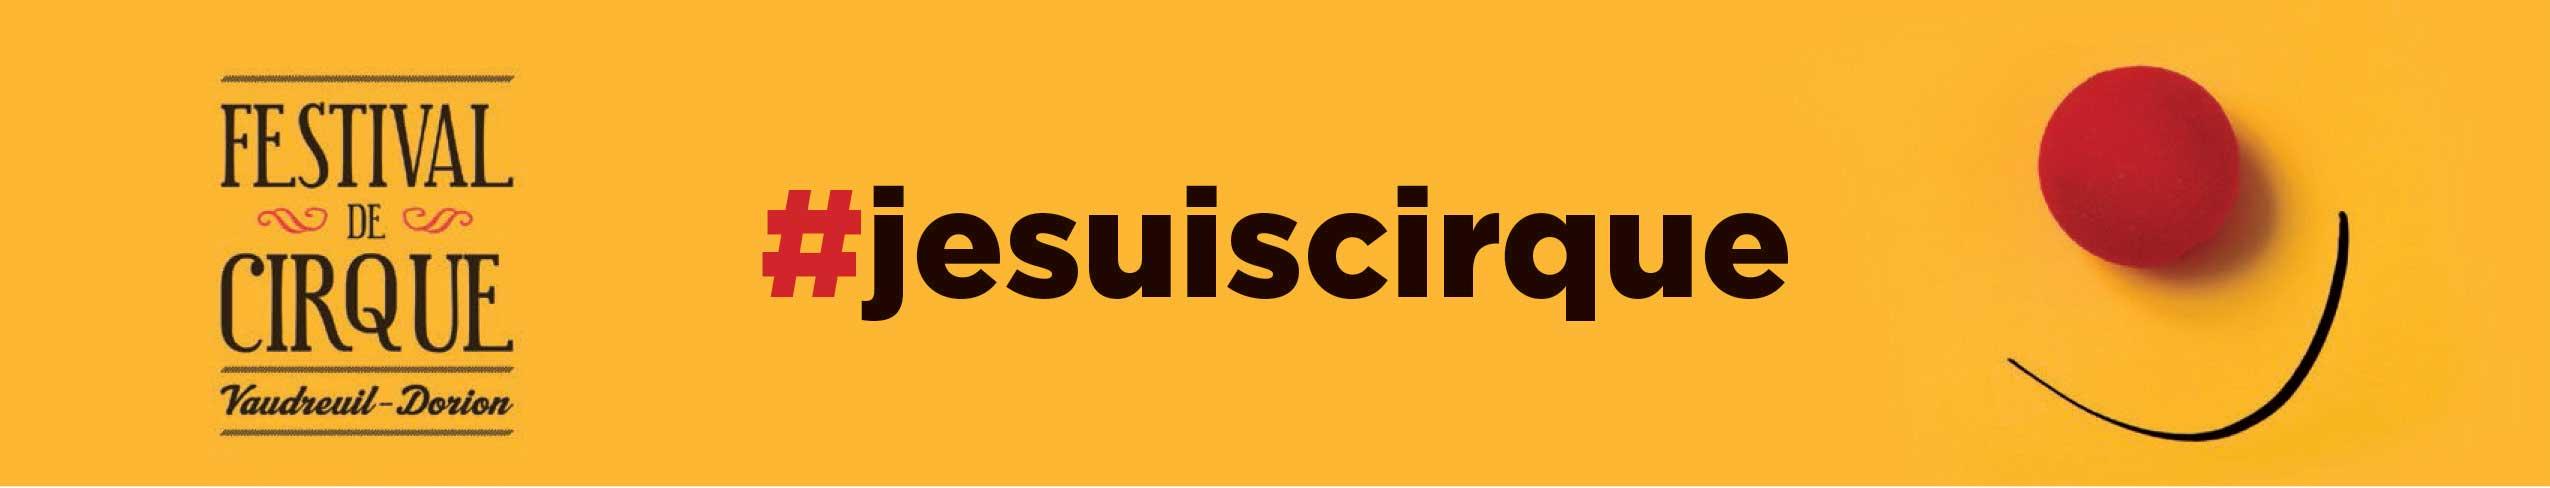 JeSuisCirque.jpg (52 KB)